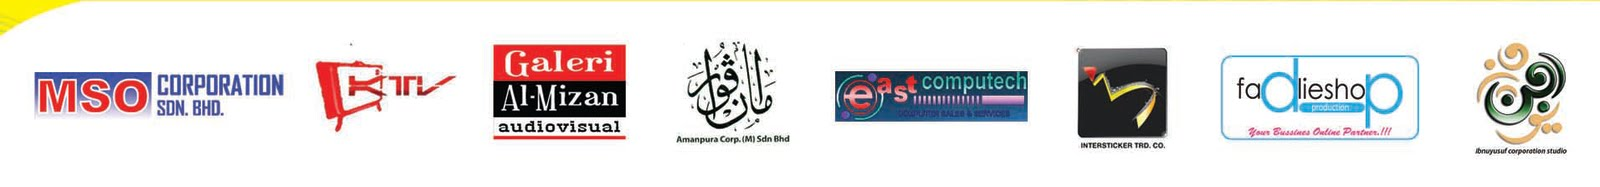 http://1.bp.blogspot.com/_vV-9TRmZFM4/TDbh_YejV1I/AAAAAAAABPA/ZPw7nv1kjYc/s1600/sponsor+2.jpg